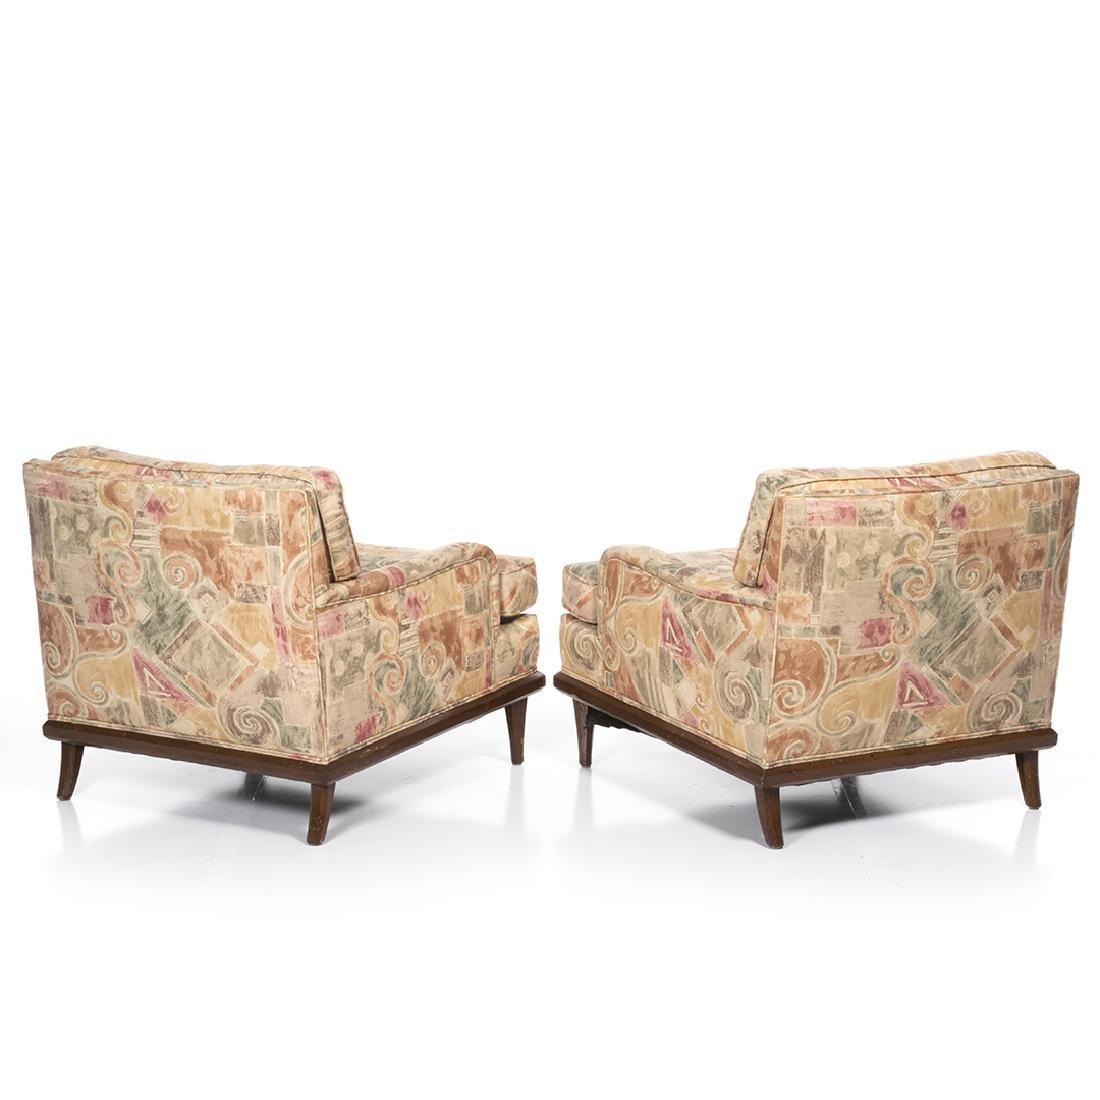 Mid-Century Modern Club chairs - 2